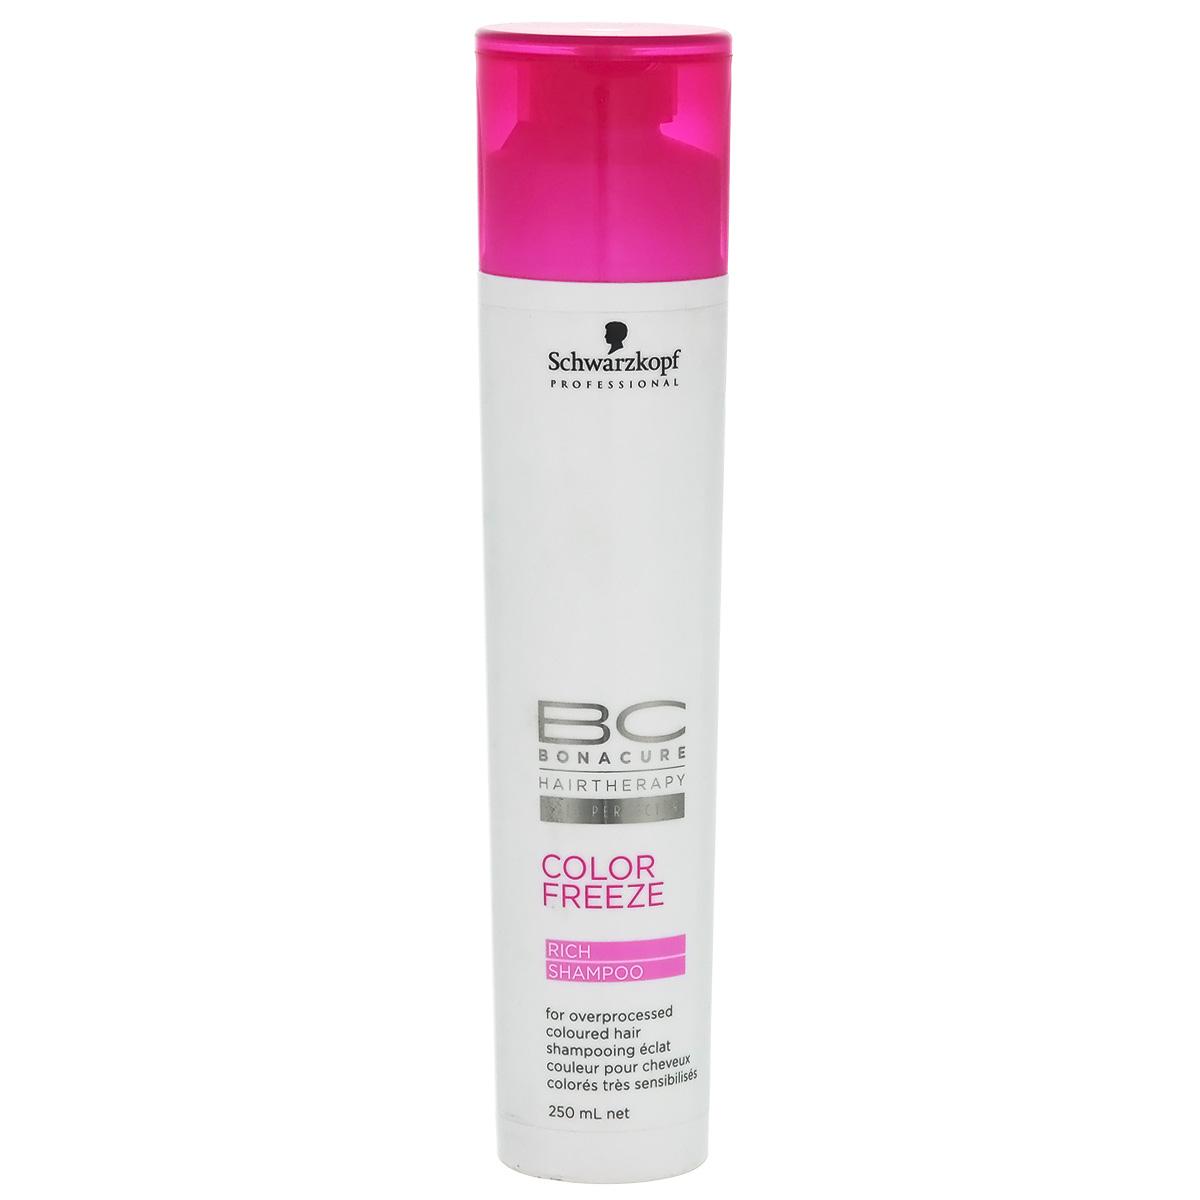 Bonacure BC Шампунь для волос Color Freeze, 250 мл